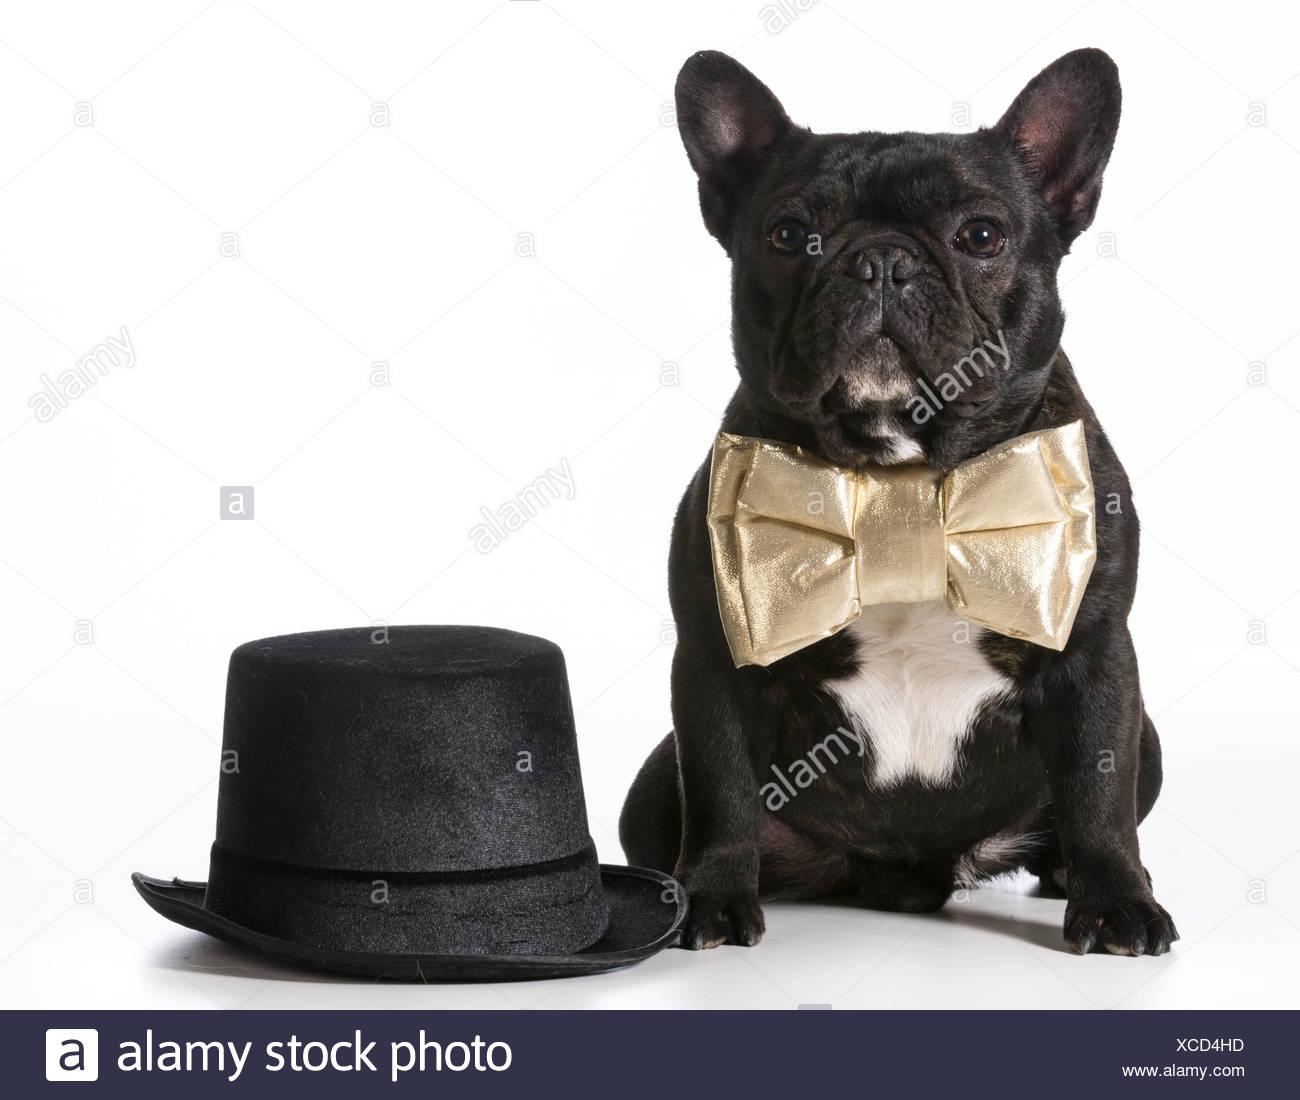 2e6883b8cc0 French Bulldog Bow Tie Stock Photos   French Bulldog Bow Tie Stock ...